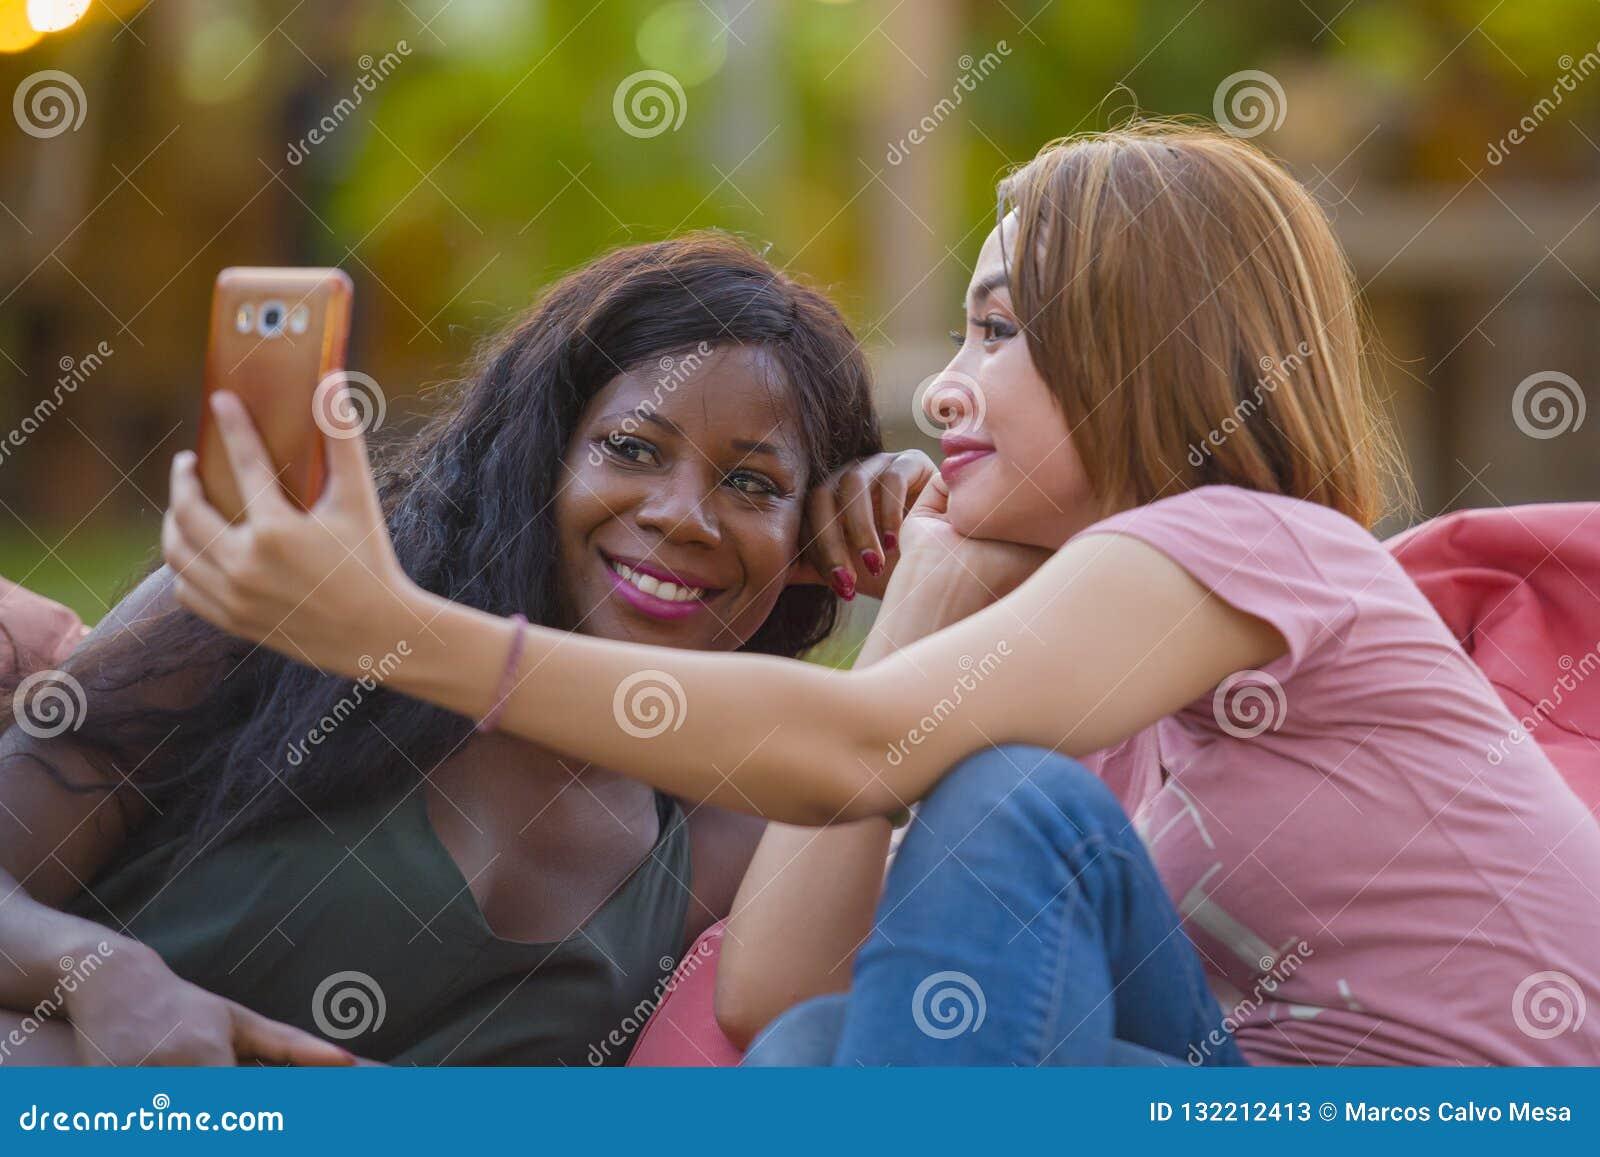 adolescent DP sexe vidéos